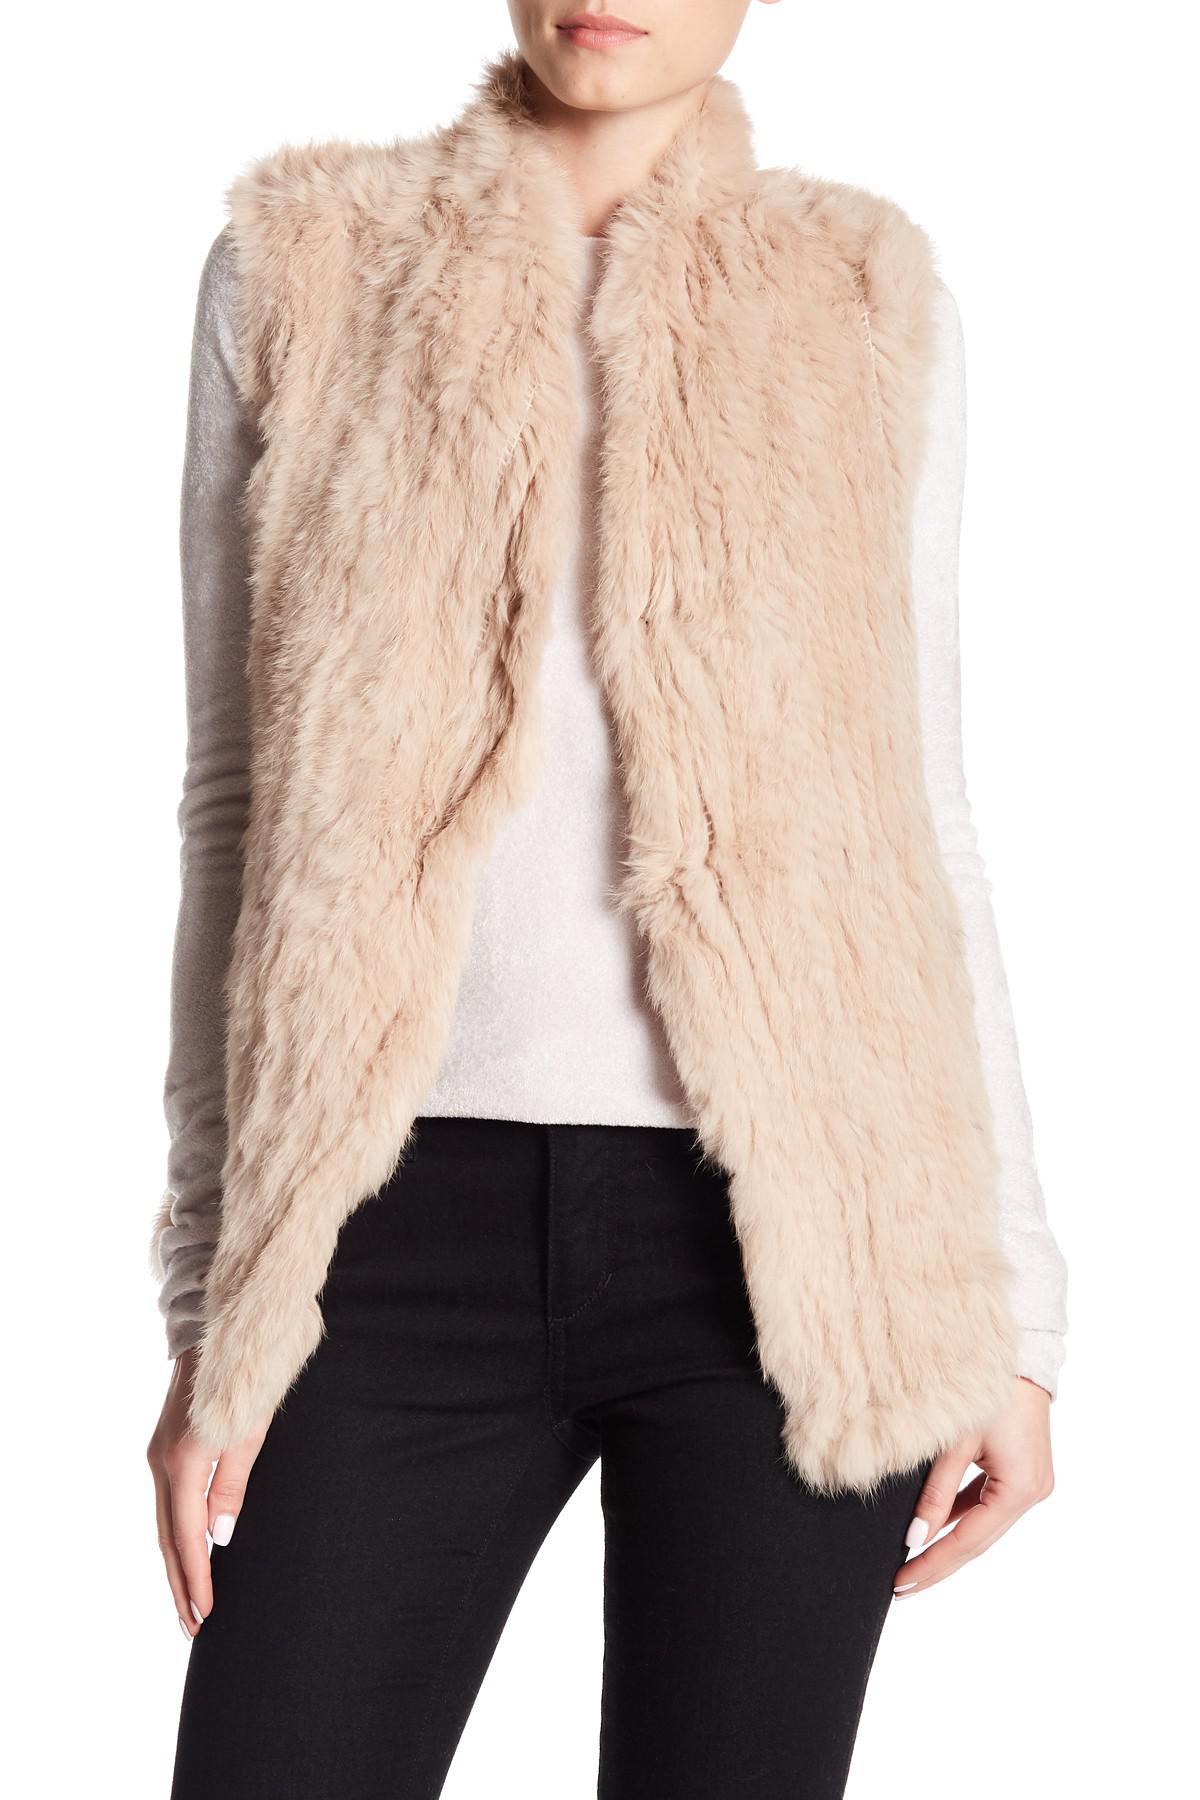 adf2261ee Love Token Genuine Dyed Rabbit Fur High Neck Vest in Pink - Lyst